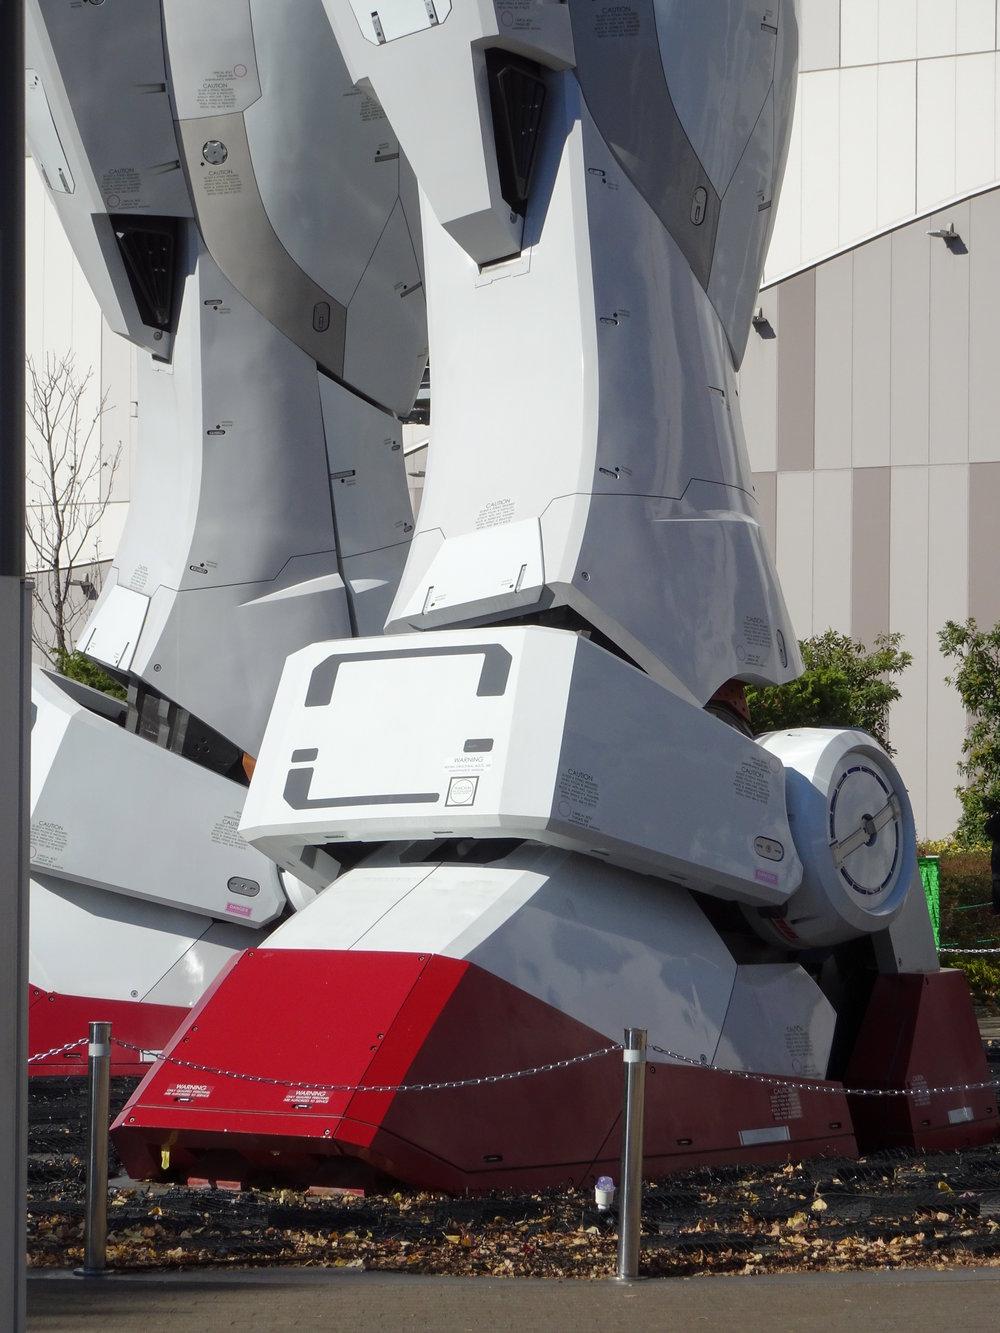 RX-78-2 Gundam 1-1 Statue - 013.jpg